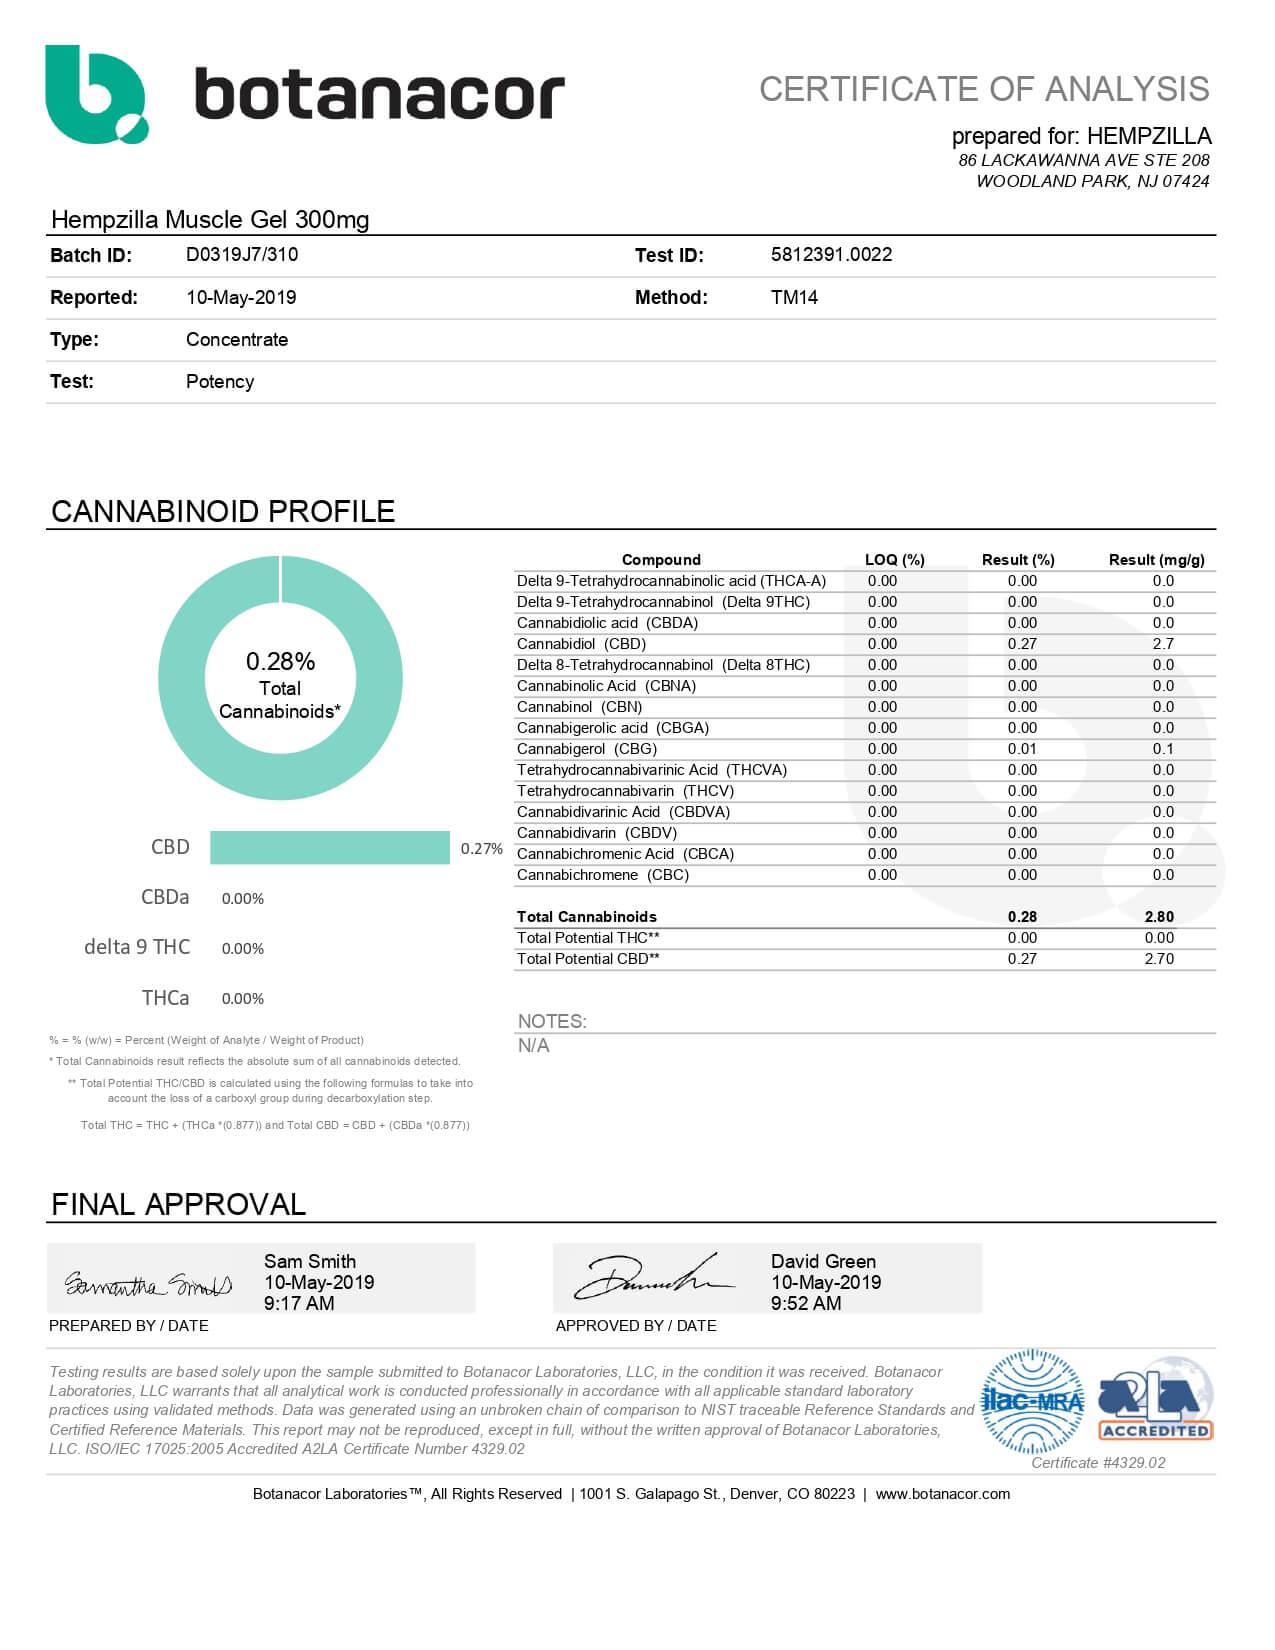 Hempzilla CBD Topical Muscle Gel 300mg Lab Report